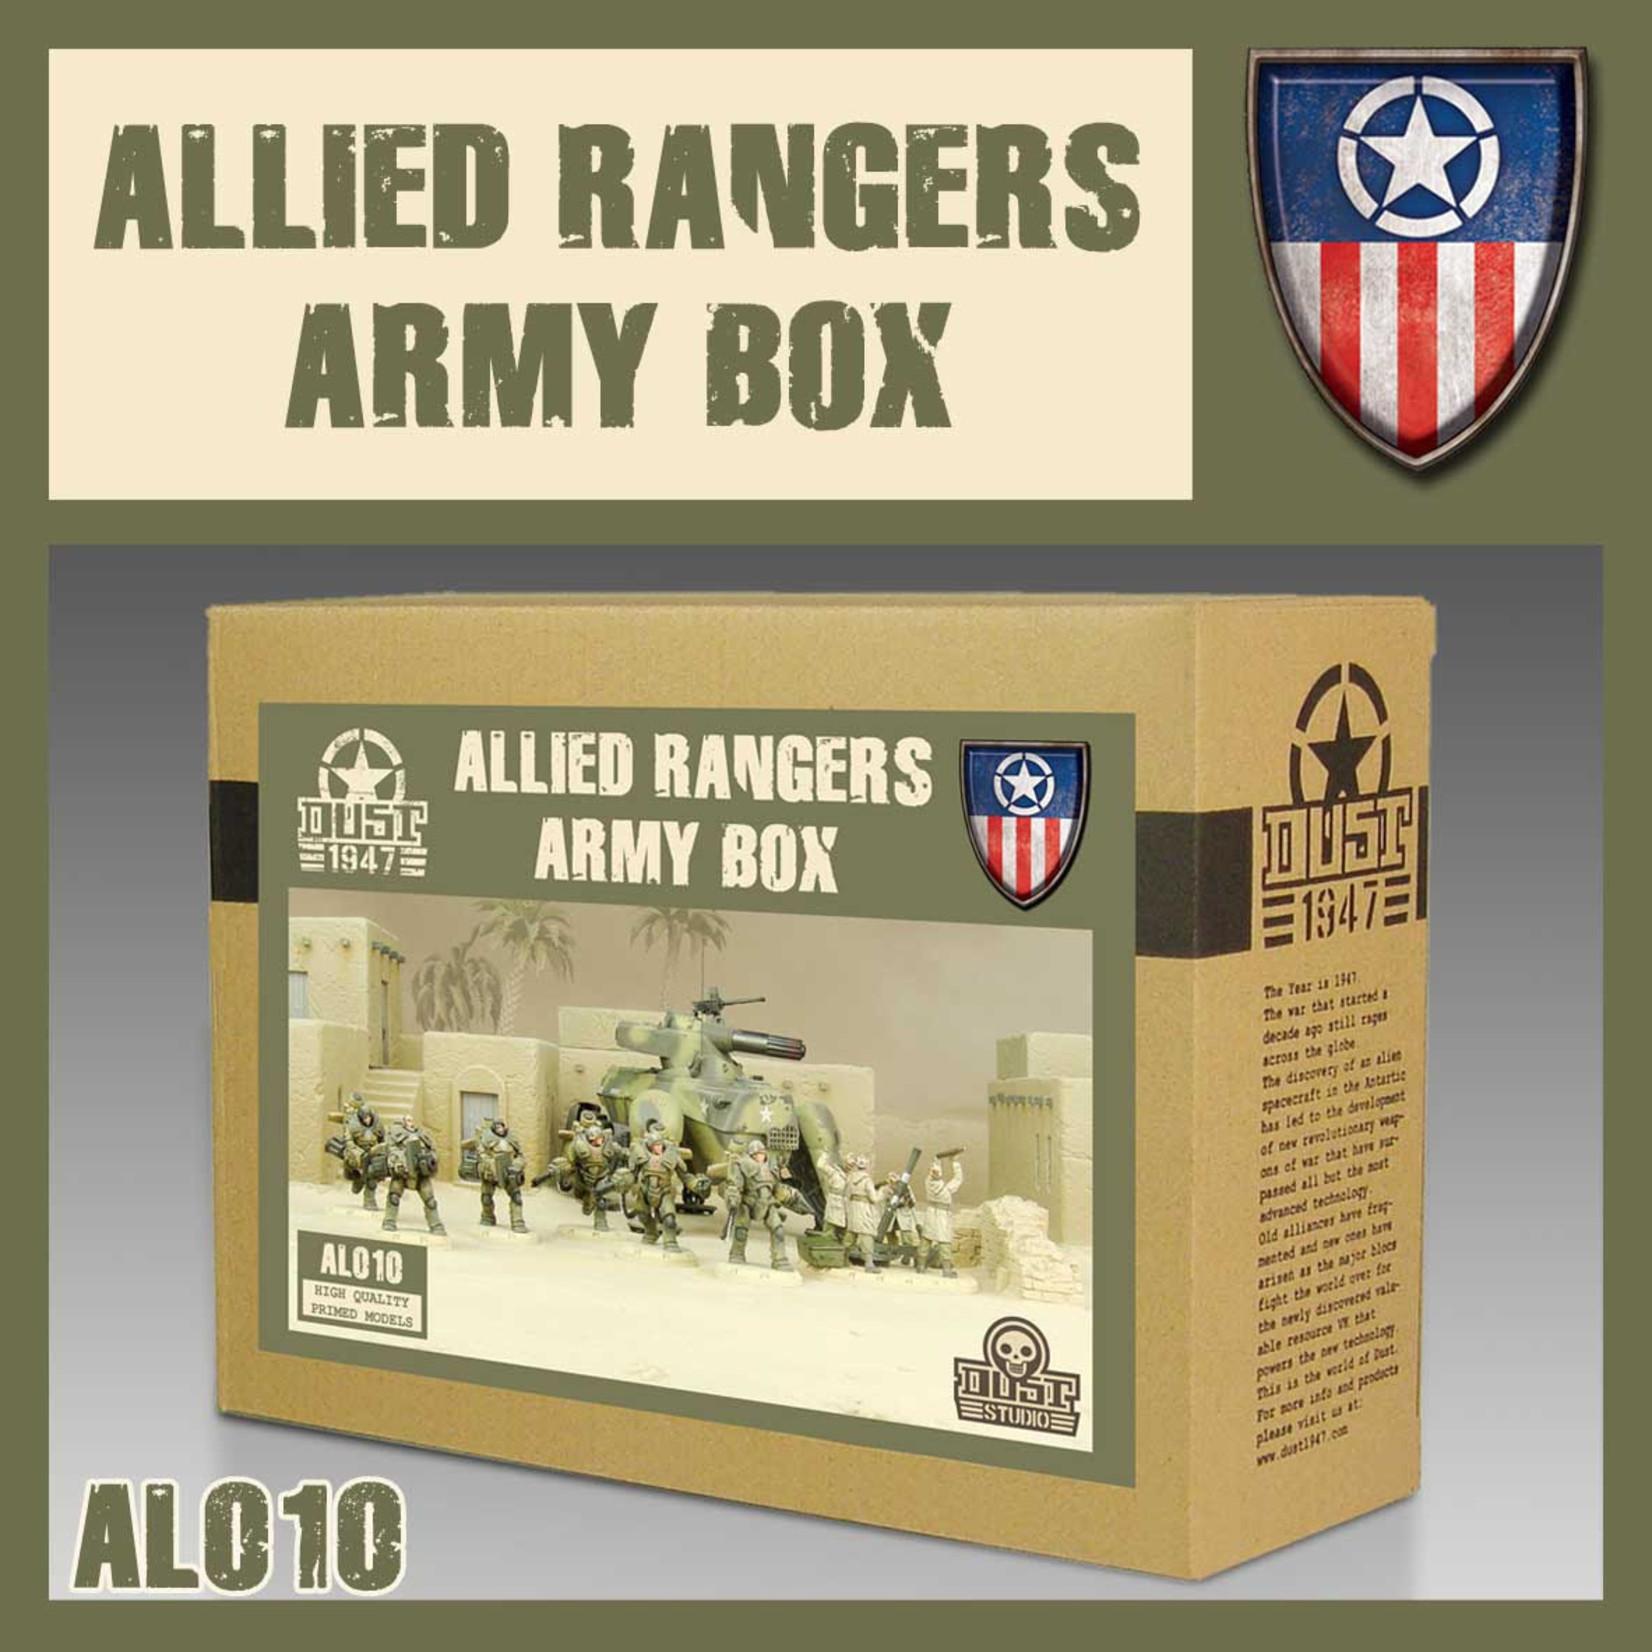 Dust DUST 1947: Heavy Ranger Army Box